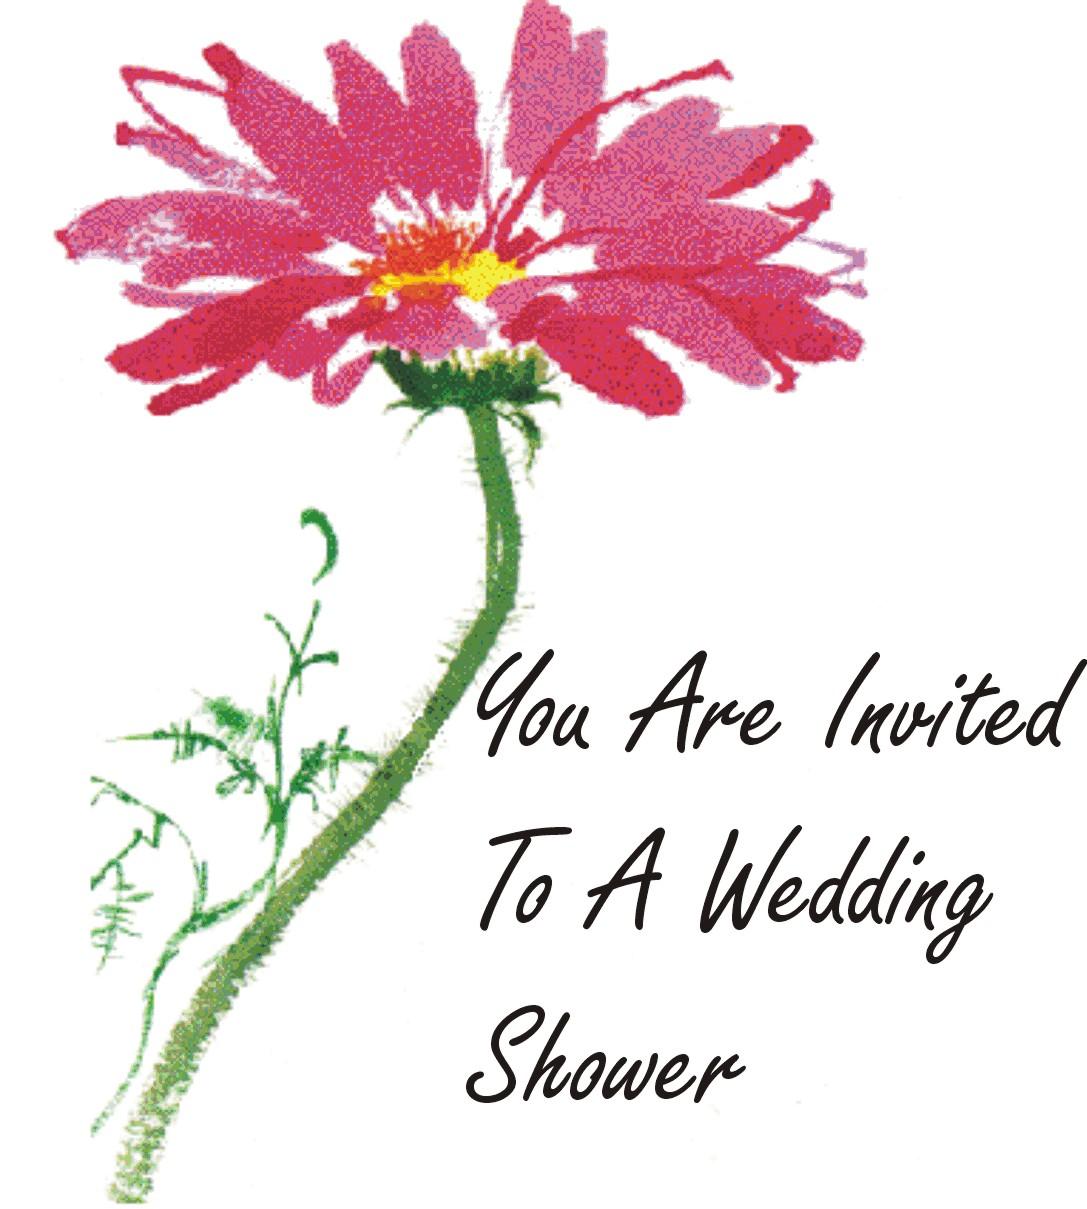 wedding shower for two women diner clip art diner clip art